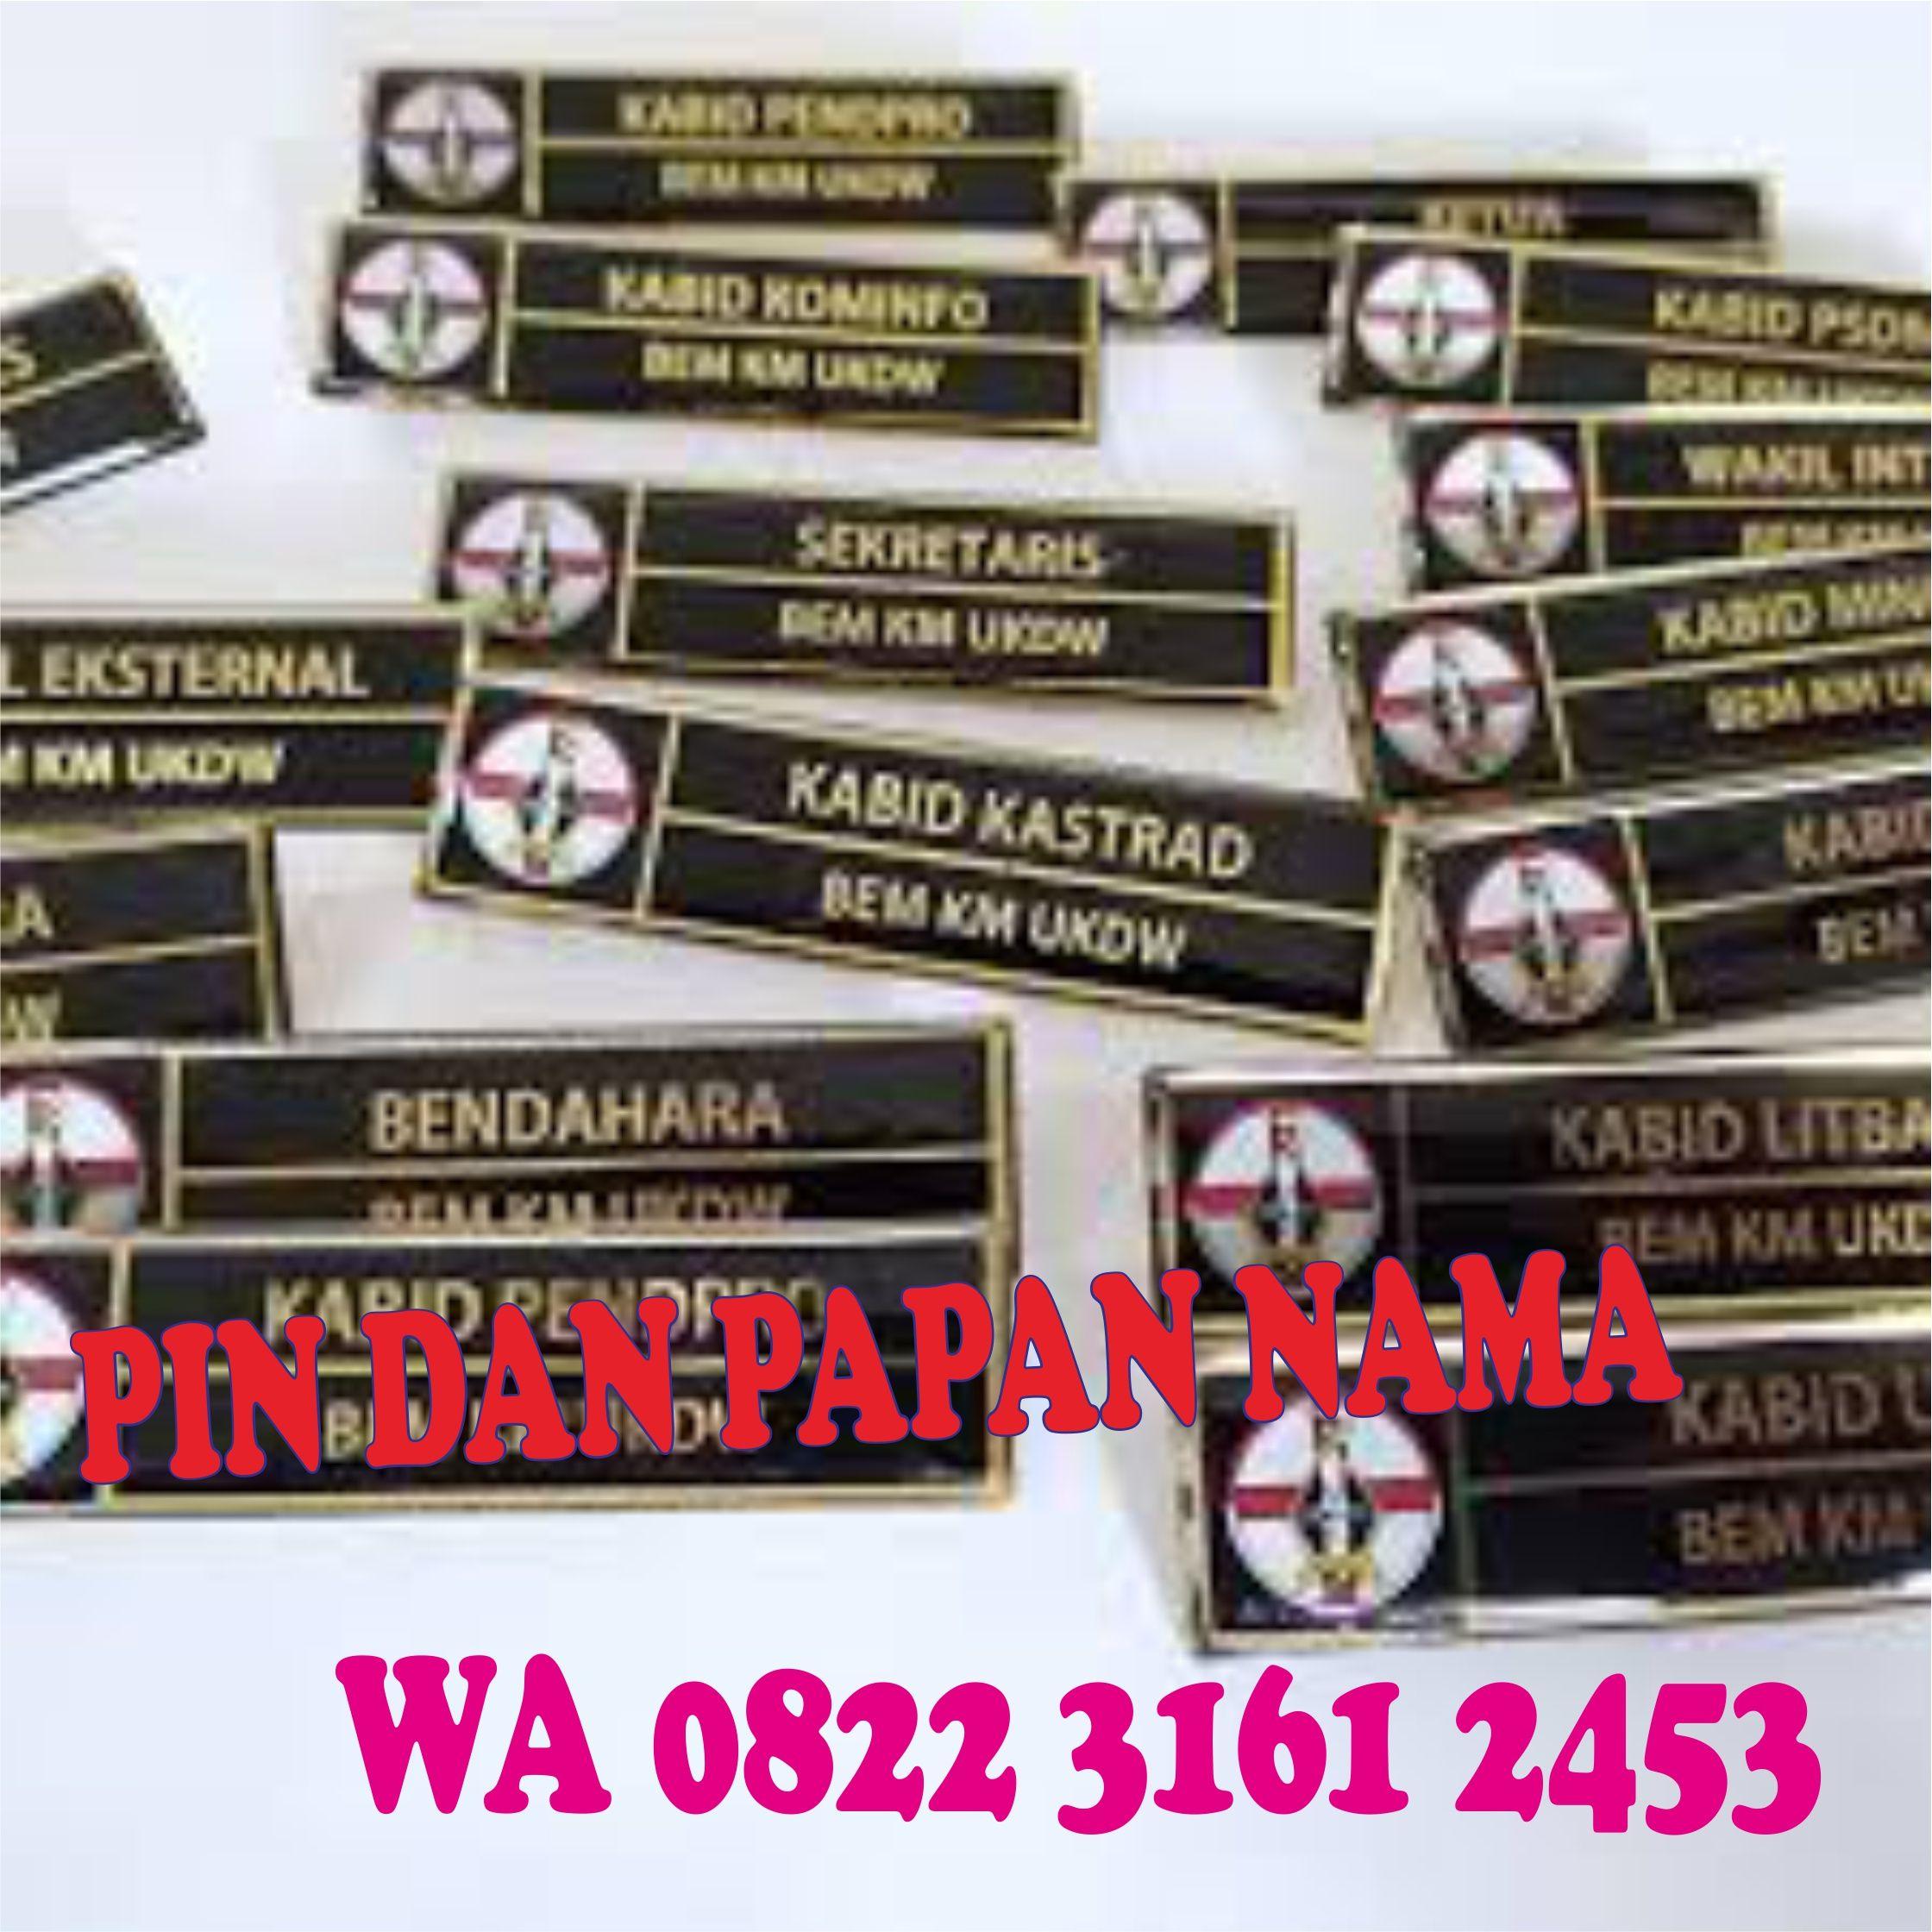 Pusat Wa 0822 3161 2453 Papan Nama Galvalum Rantau Prapat Produsen Pin Nama Jual Papan Nama Kebumen Nama Tengah